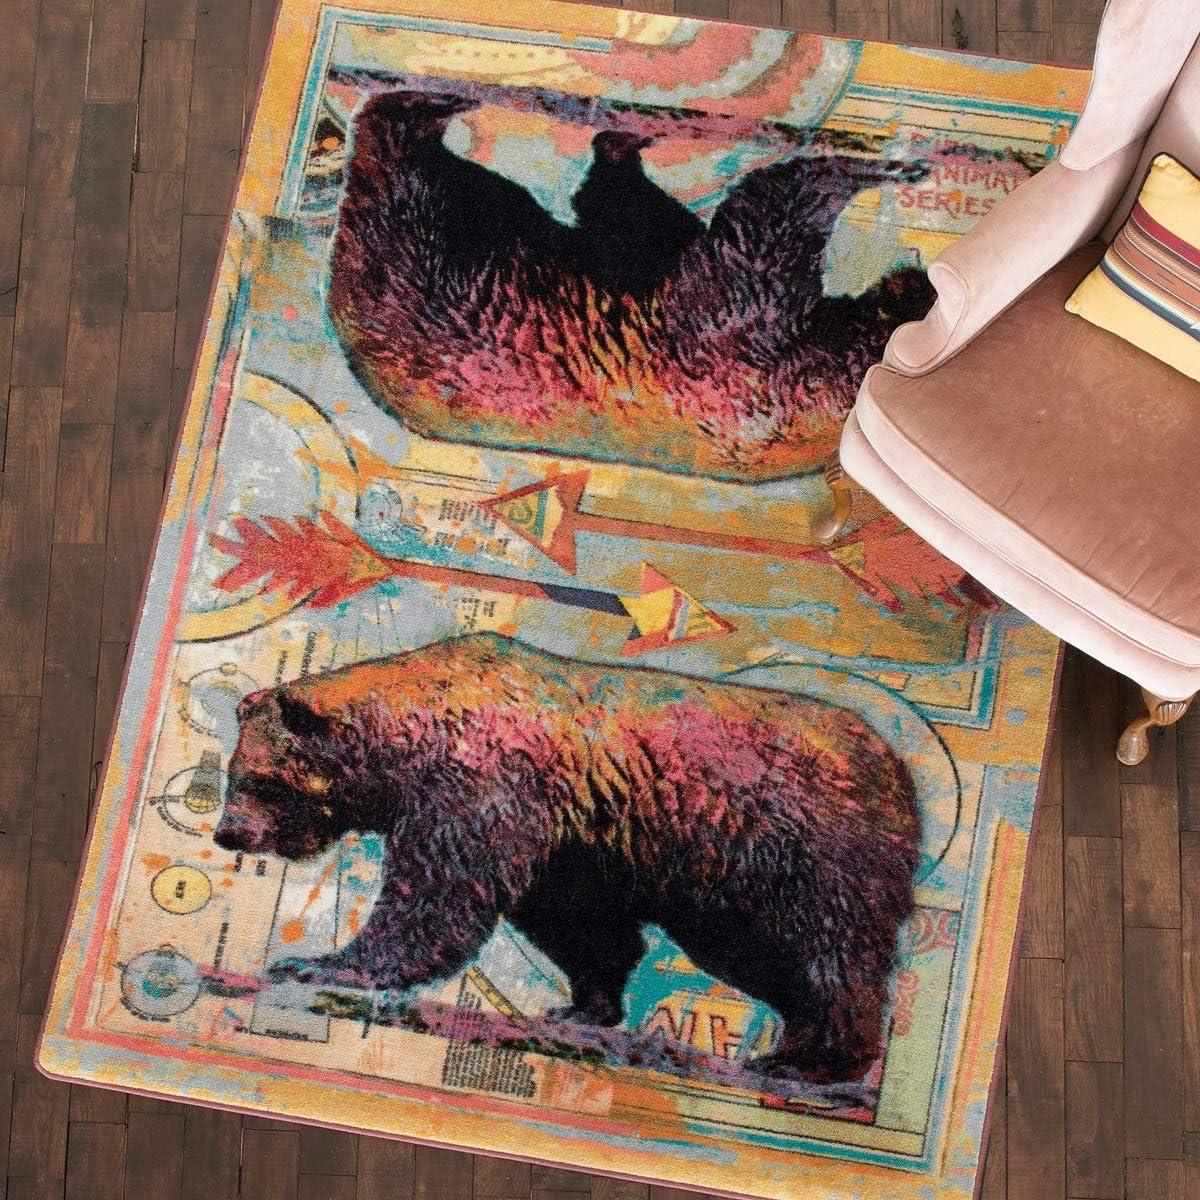 BLACK FOREST DECOR Ruiz Walking Bear 11 - Rug x 8 5% Super beauty product restock quality top! OFF